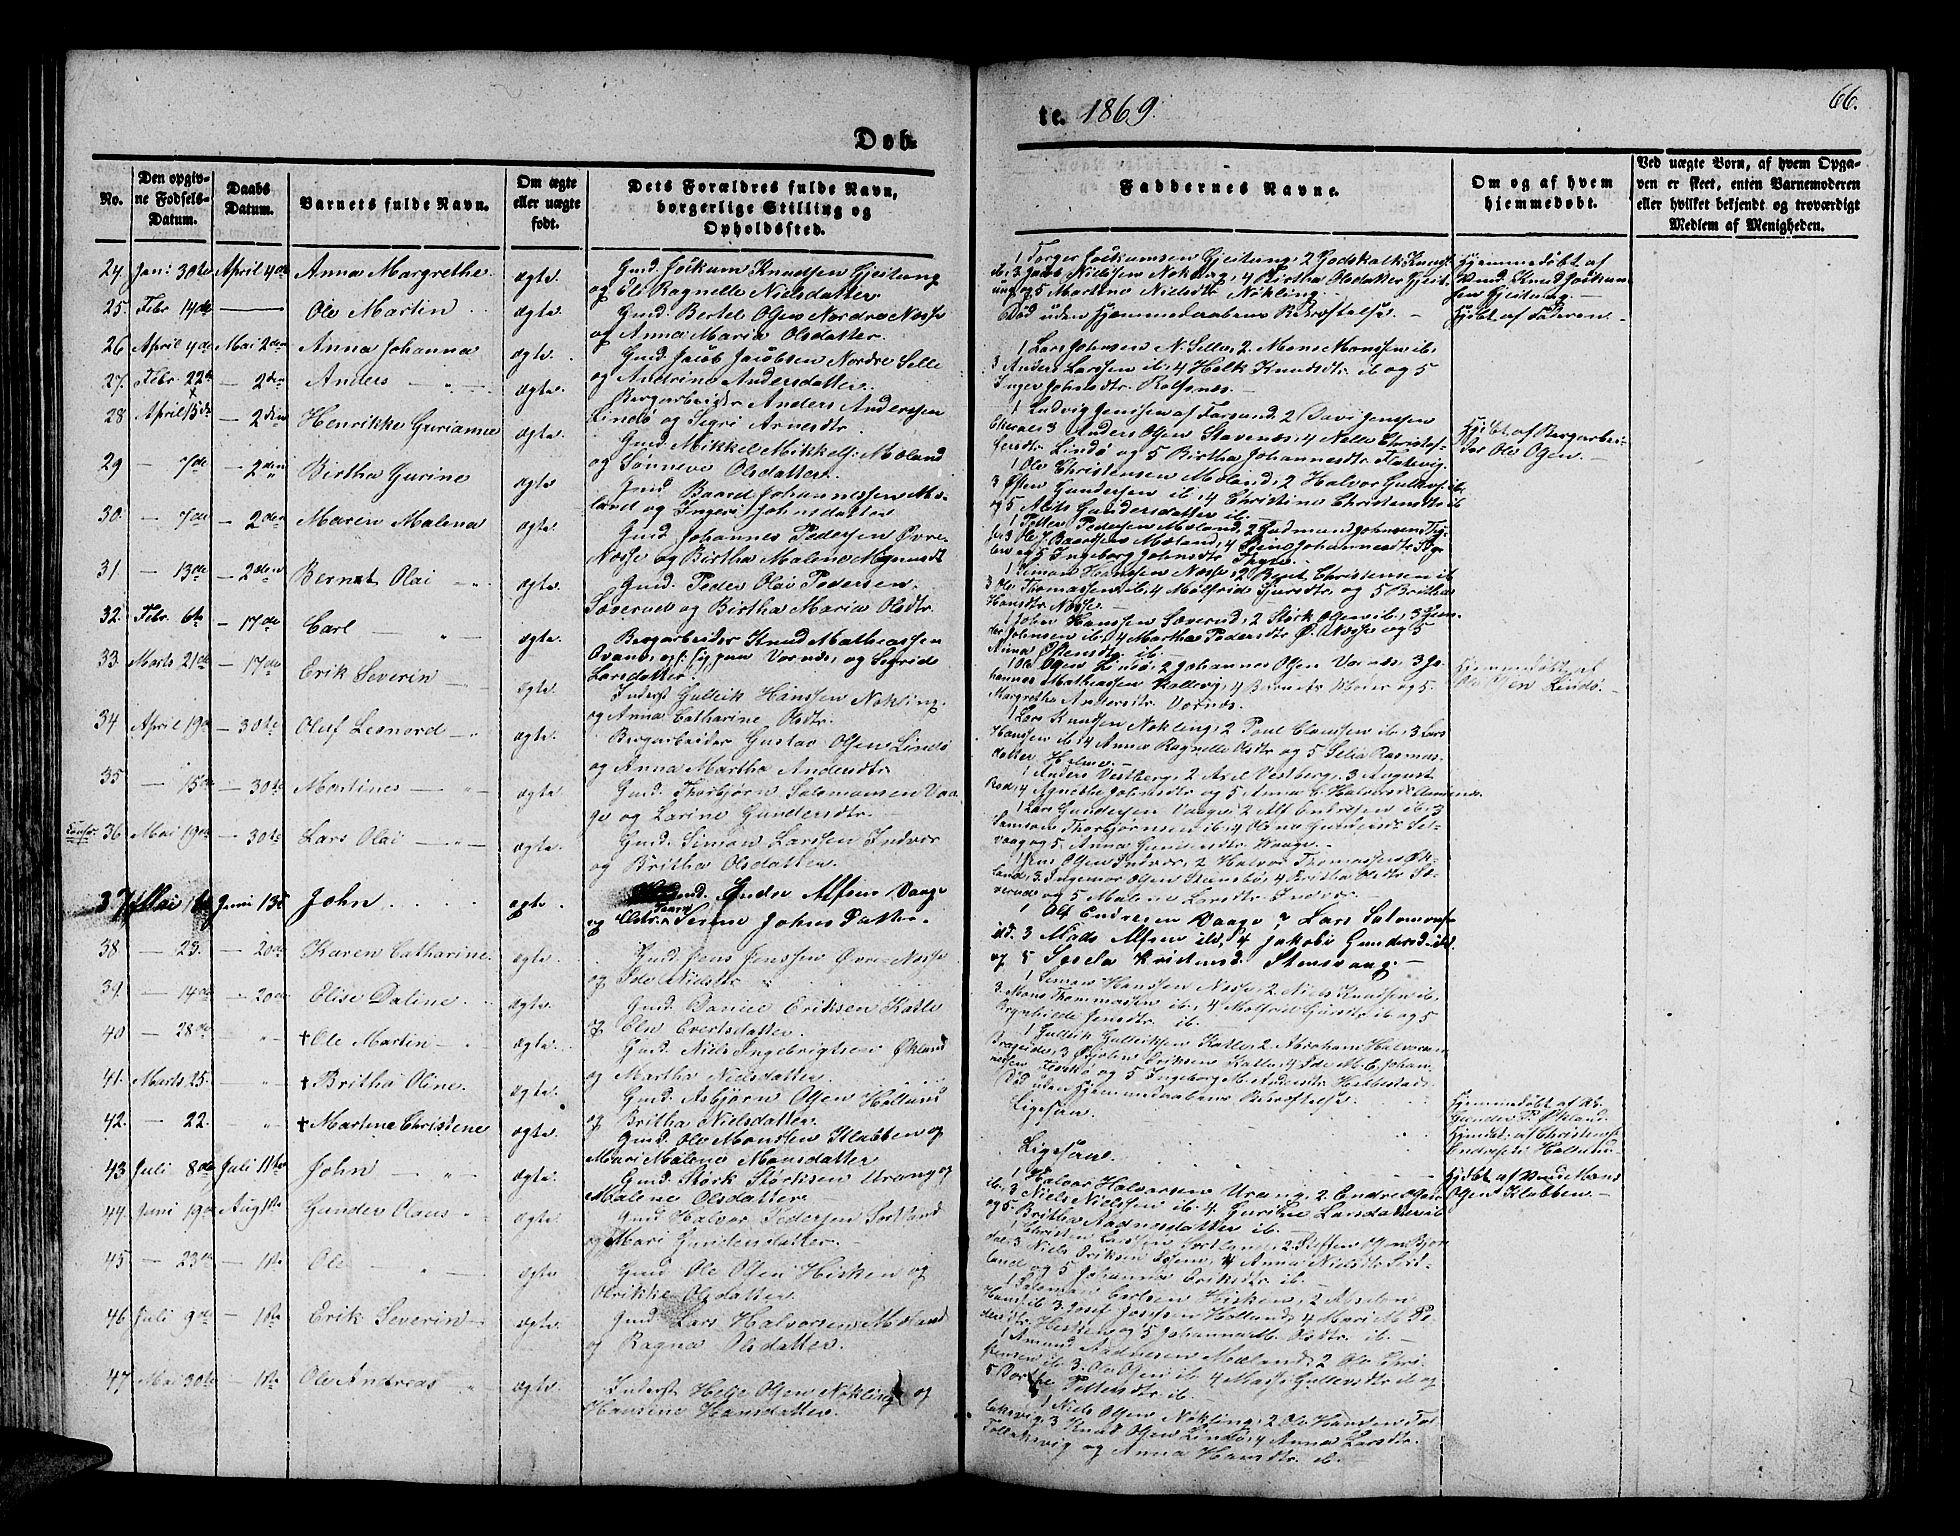 SAB, Finnås sokneprestembete, H/Ha/Hab/Habb/L0001: Klokkerbok nr. B 1, 1851-1870, s. 66